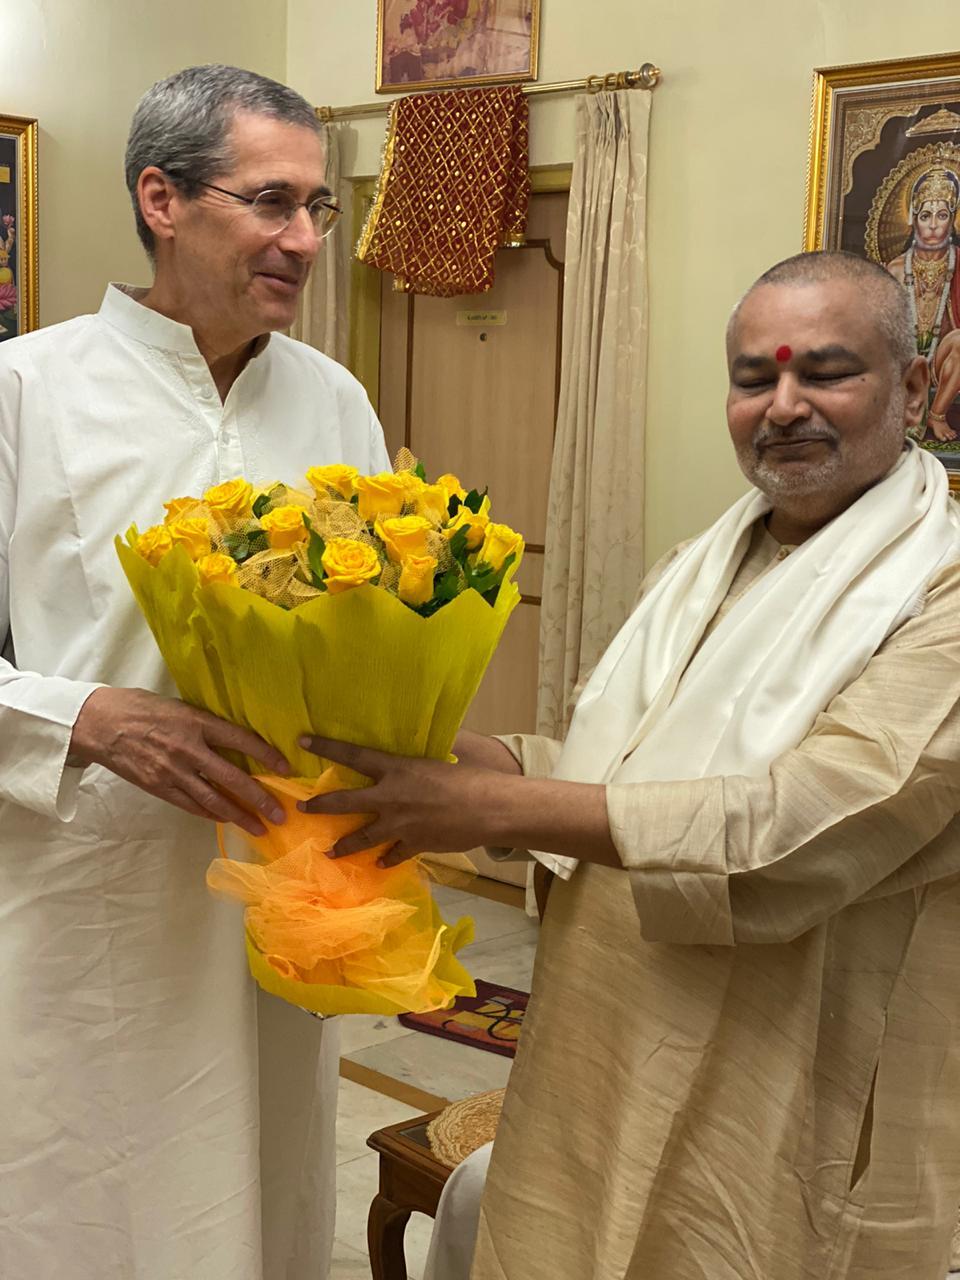 Brahmachari Girish ji honouring Raja Dr. Harris Kaplan ji